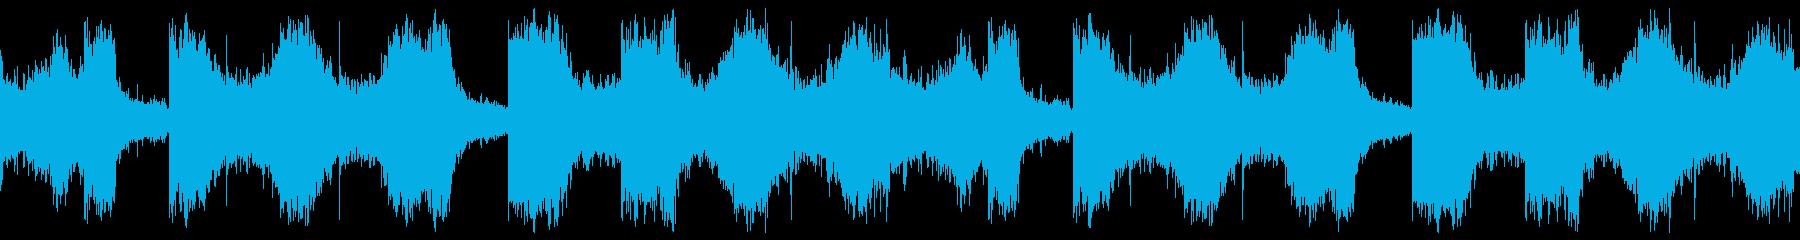 EDM リードシンセ 7 音楽制作用の再生済みの波形